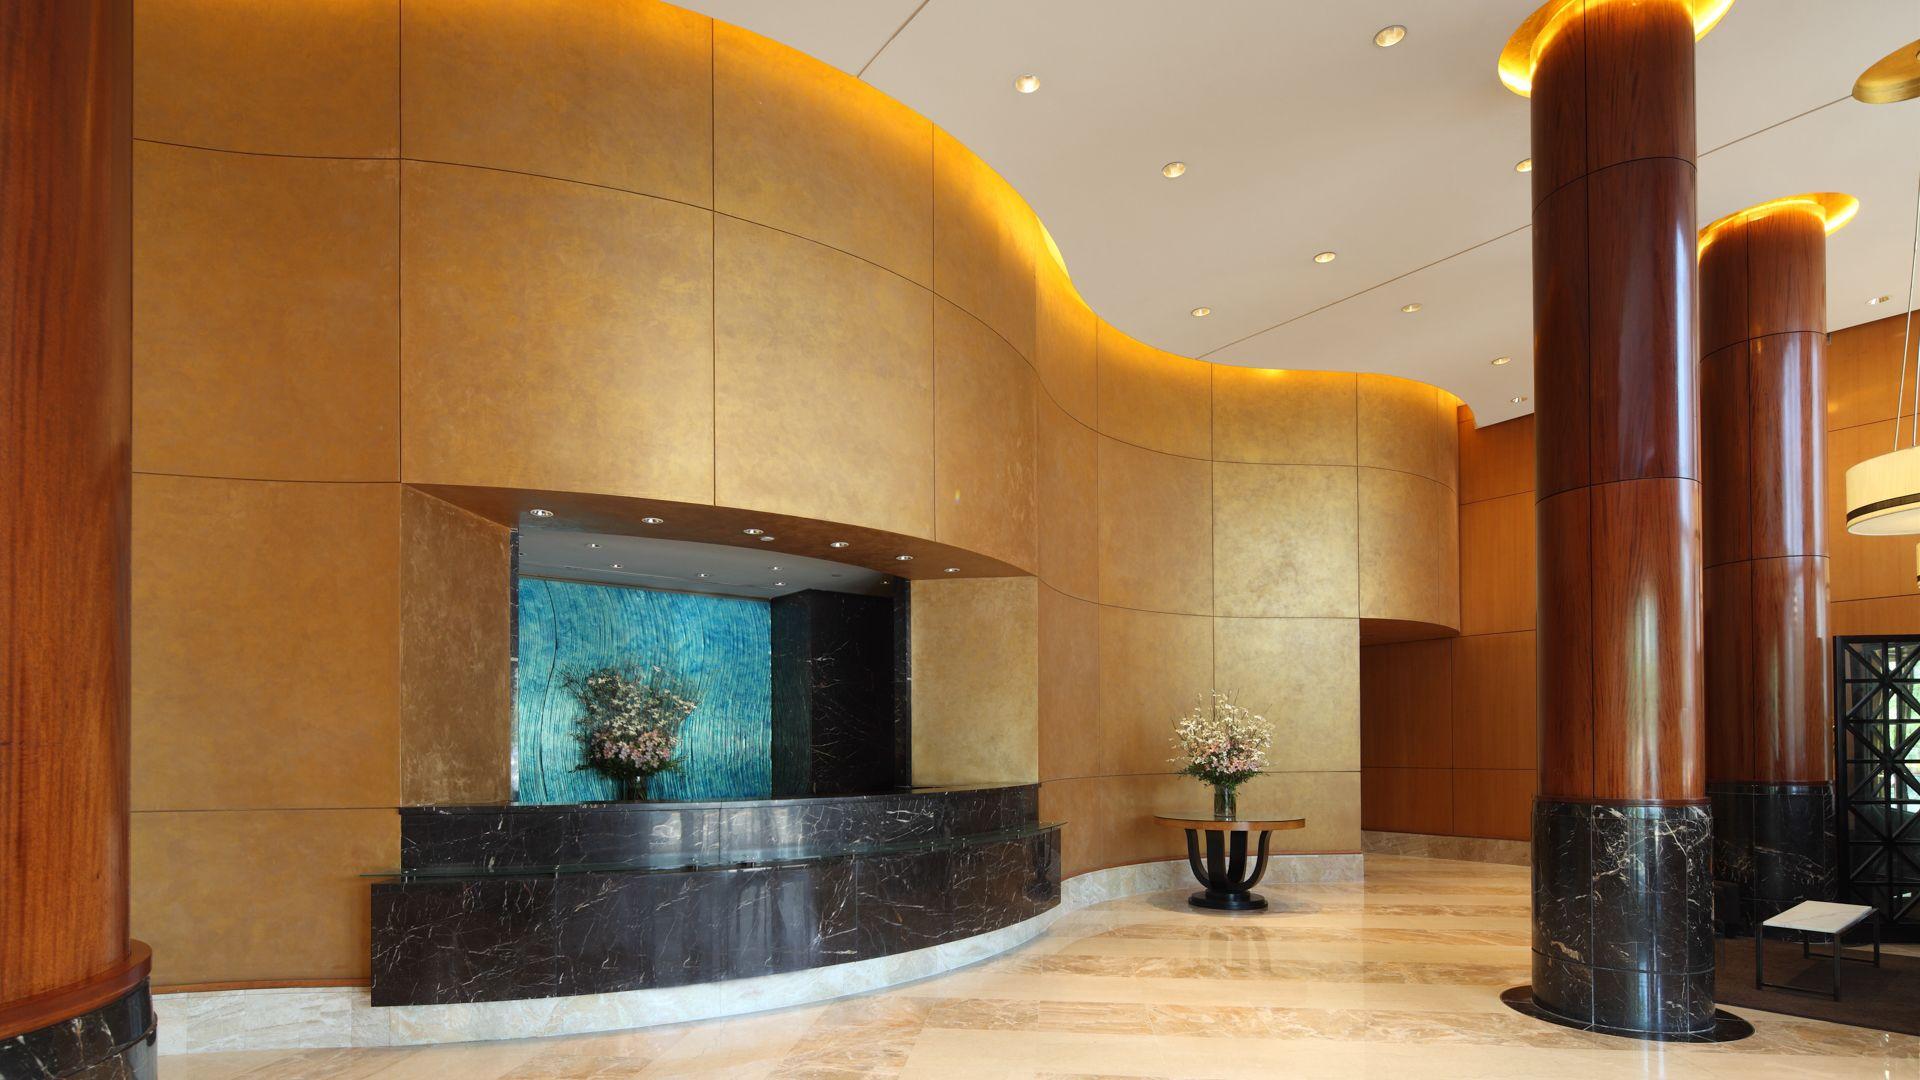 Trump Place 160 Riverside Blvd Apartments - Lobby